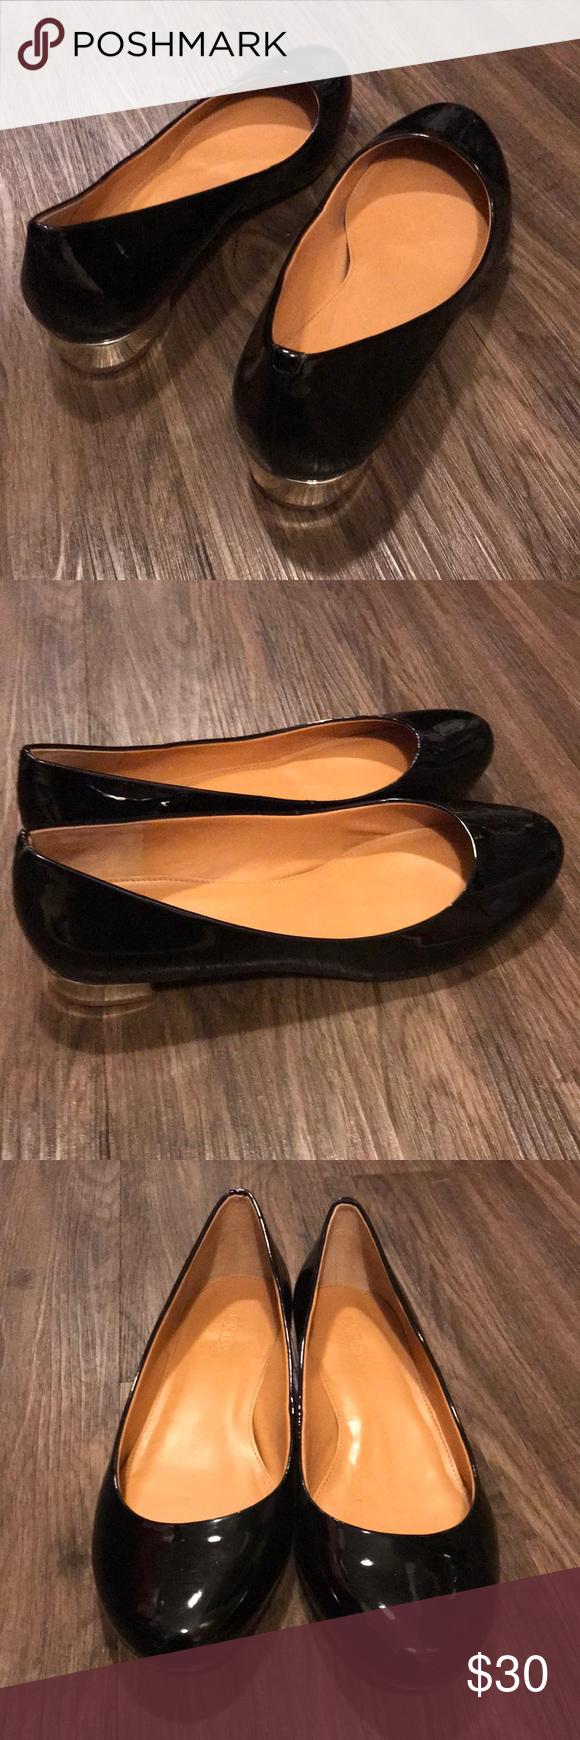 Black flats with gold heel | Gold heels